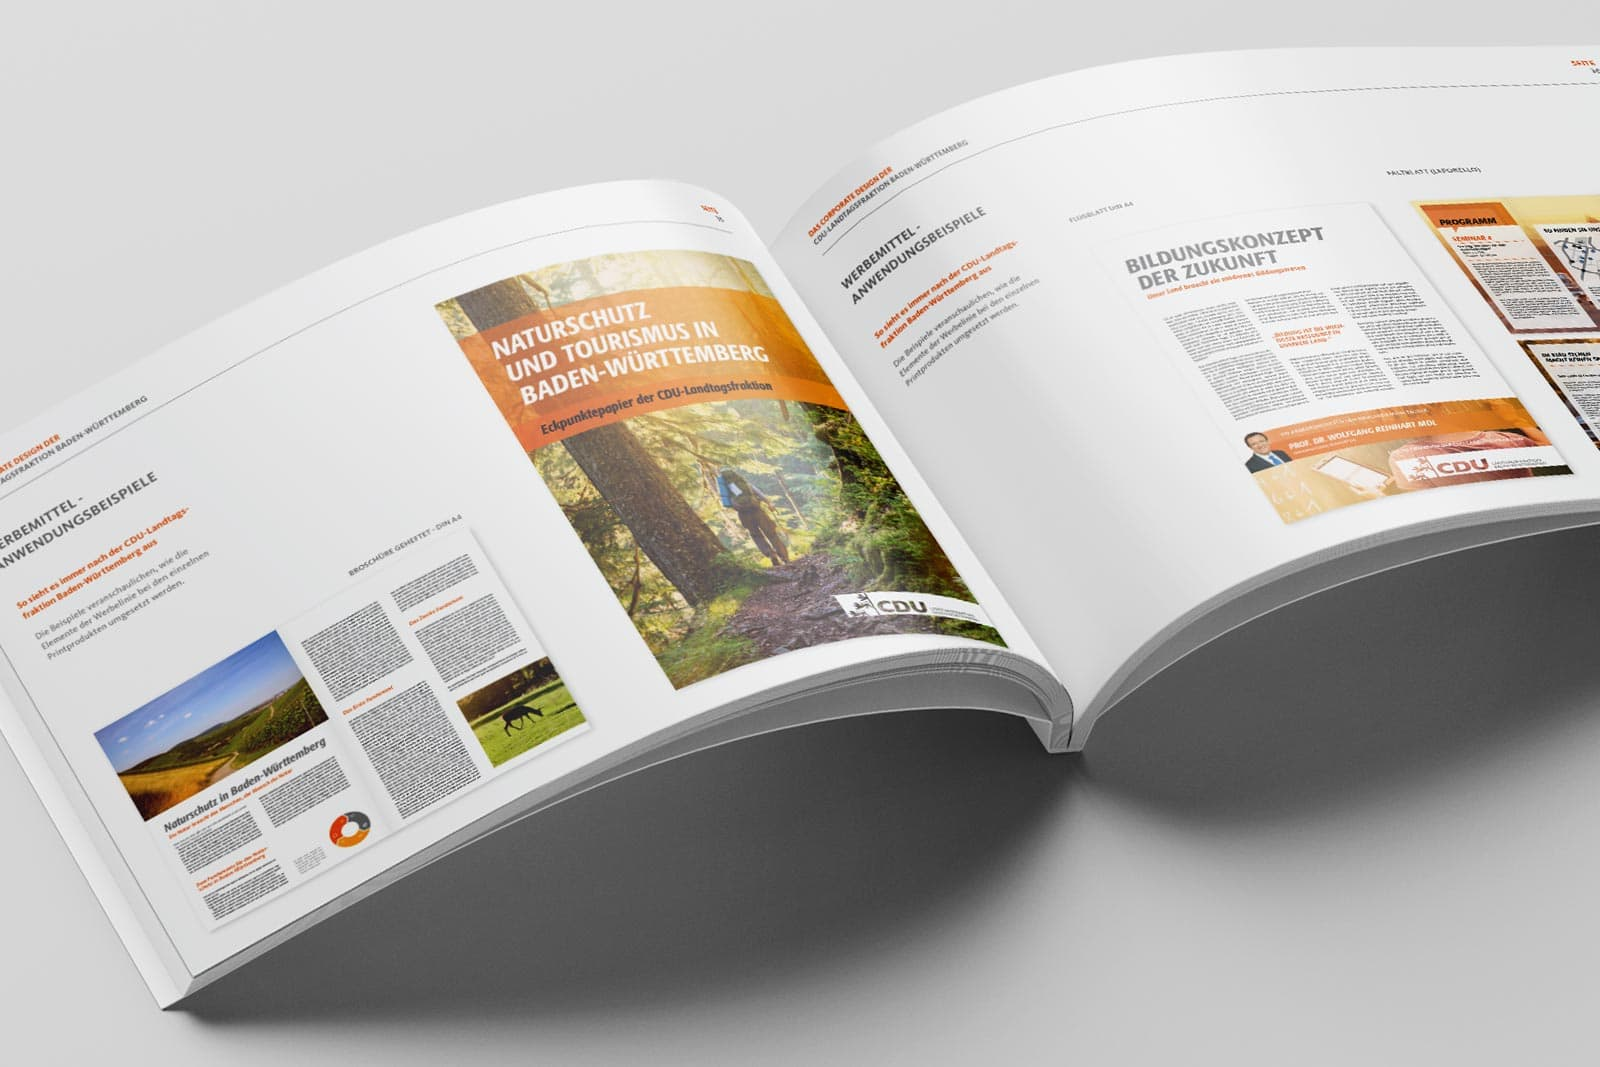 CDU_LF_BW, Styleguide, Corporate Design Relaunch, Redesign, Detail 3